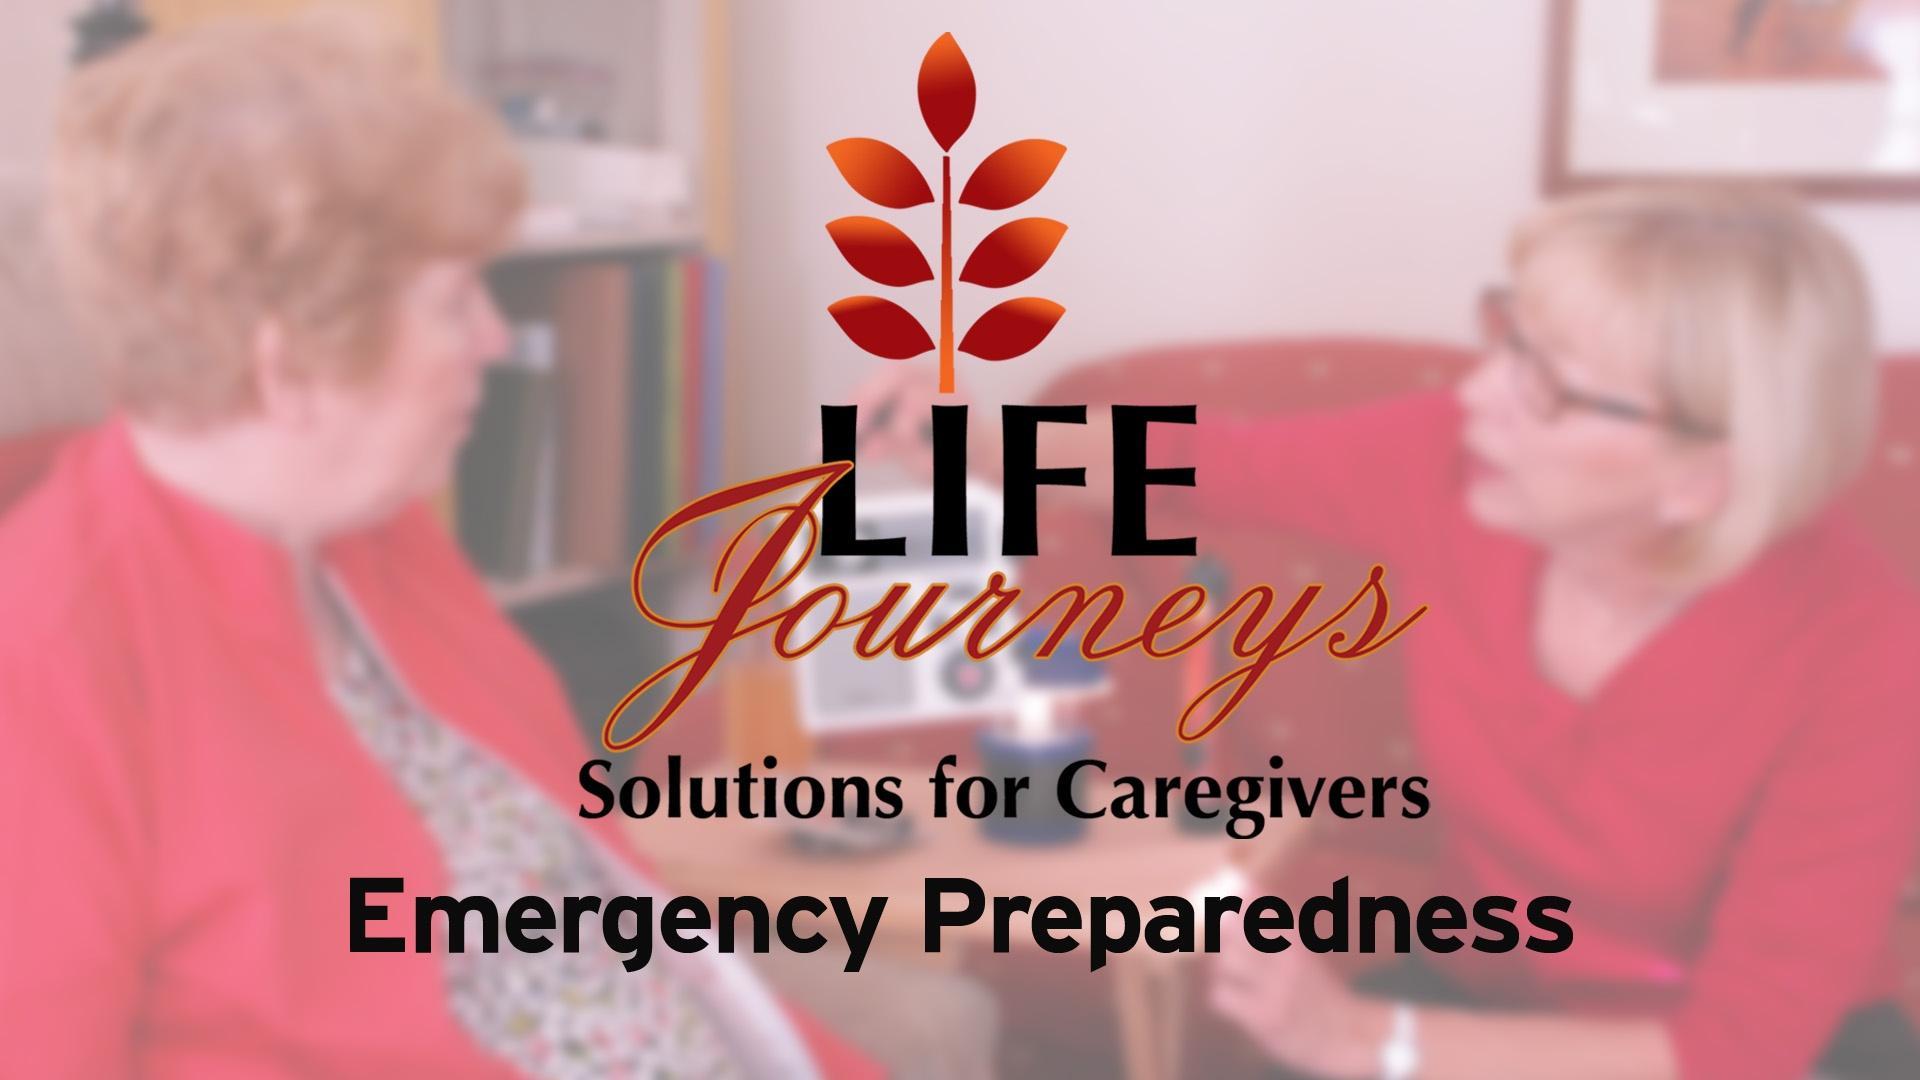 Life Journeys: Emergency Preparedness